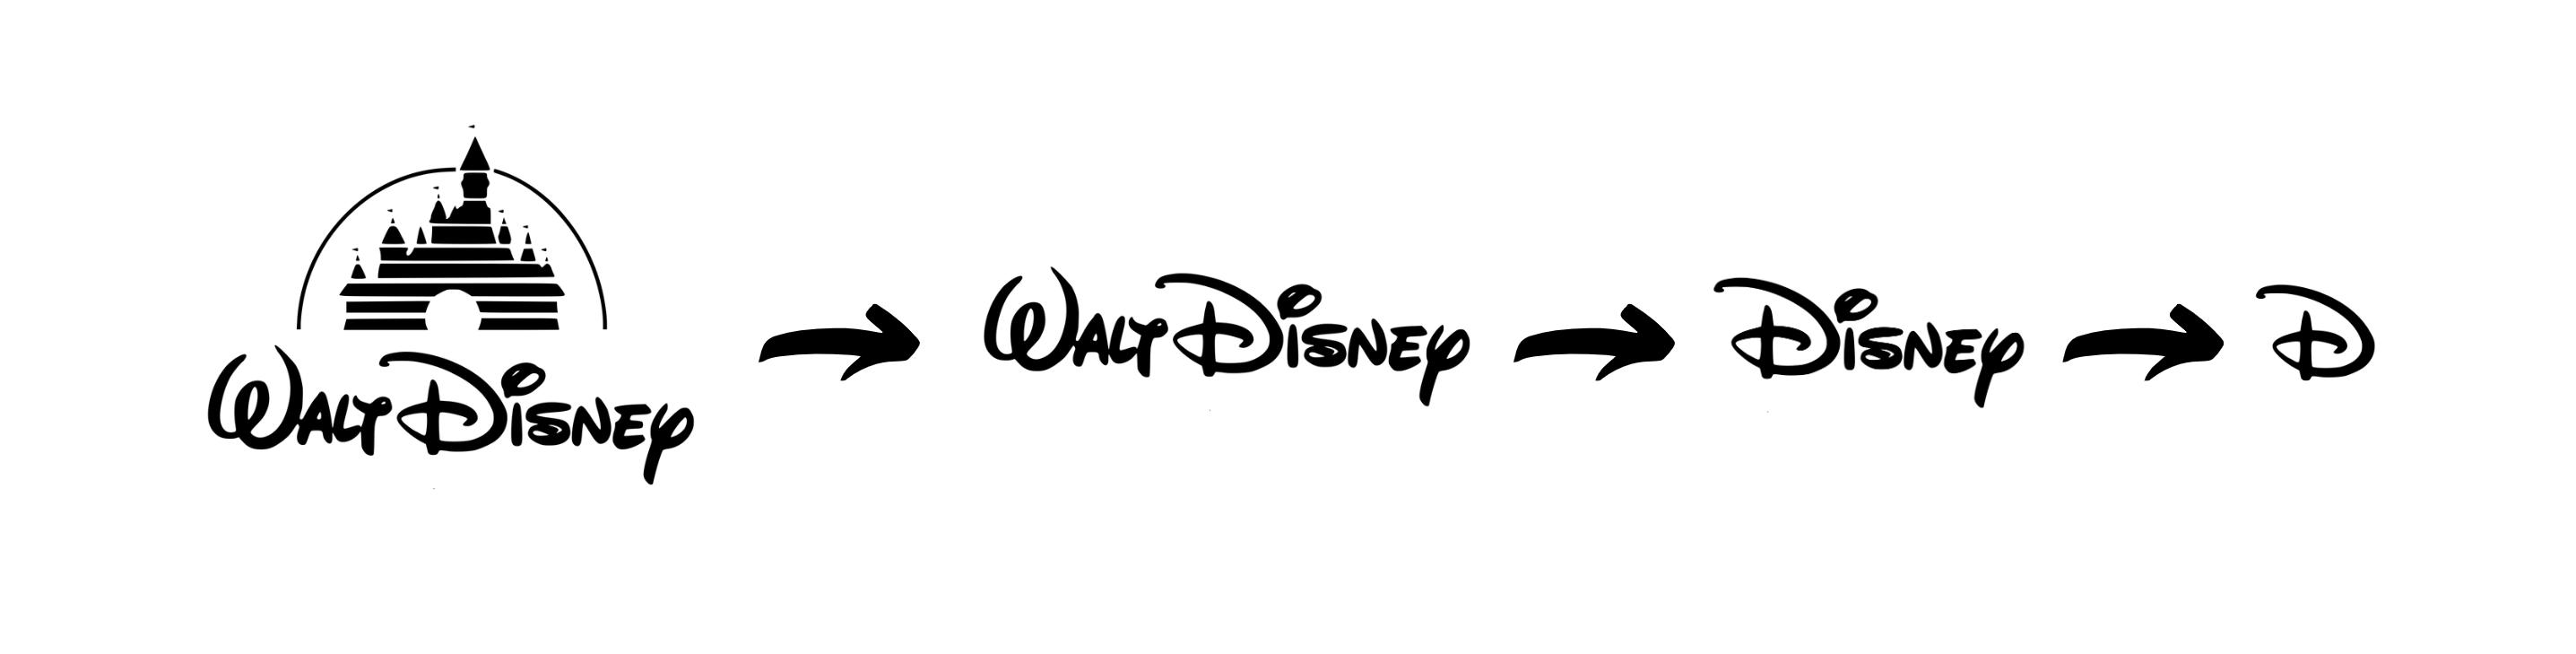 Designs.ai - What makes a great logo: Walt Disney logo evolution.